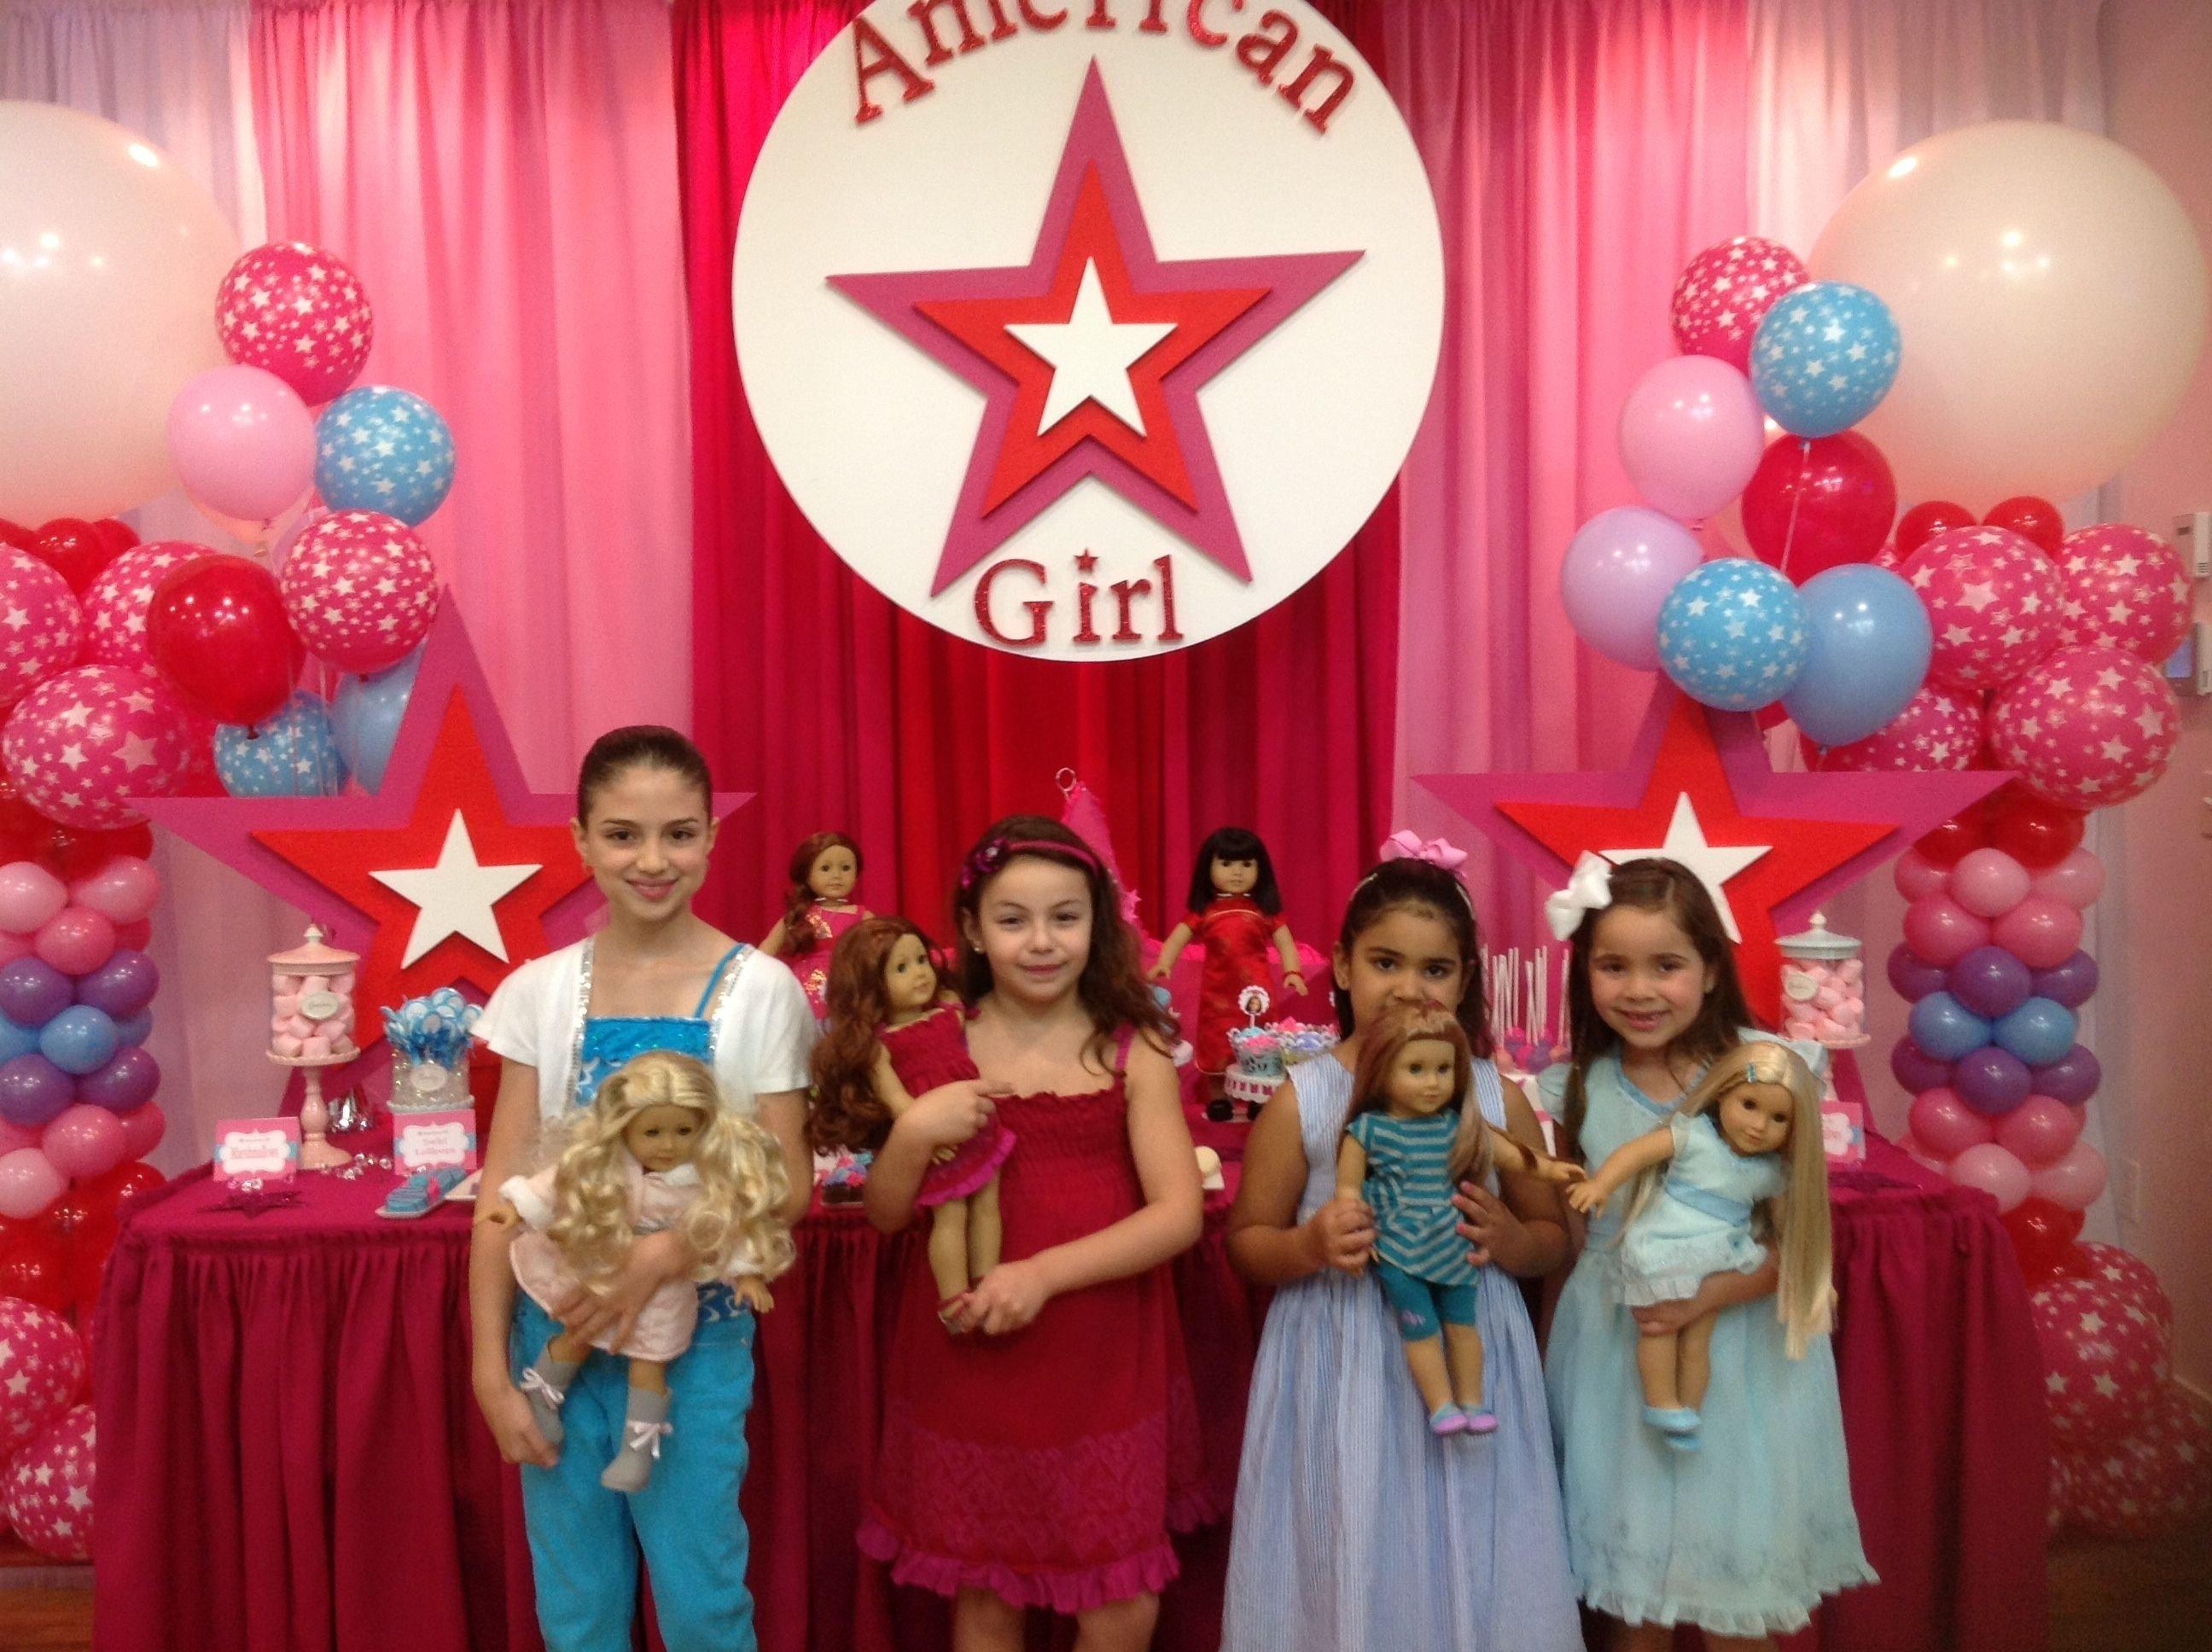 10 Spectacular American Girl Birthday Party Ideas american girl party fabulous kid party ideas pinterest 2020